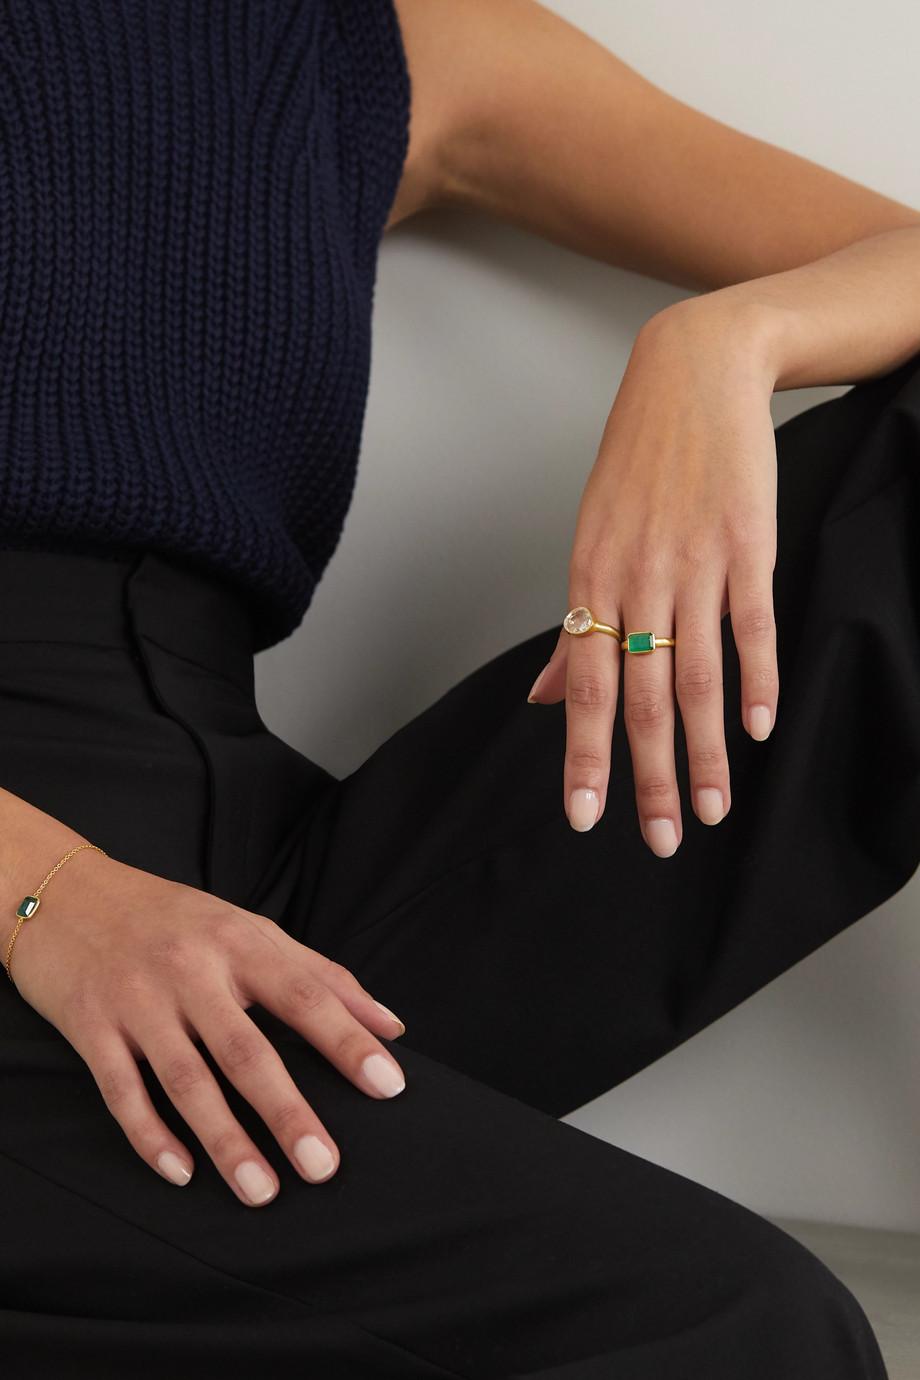 Pippa Small 18-karat gold emerald ring